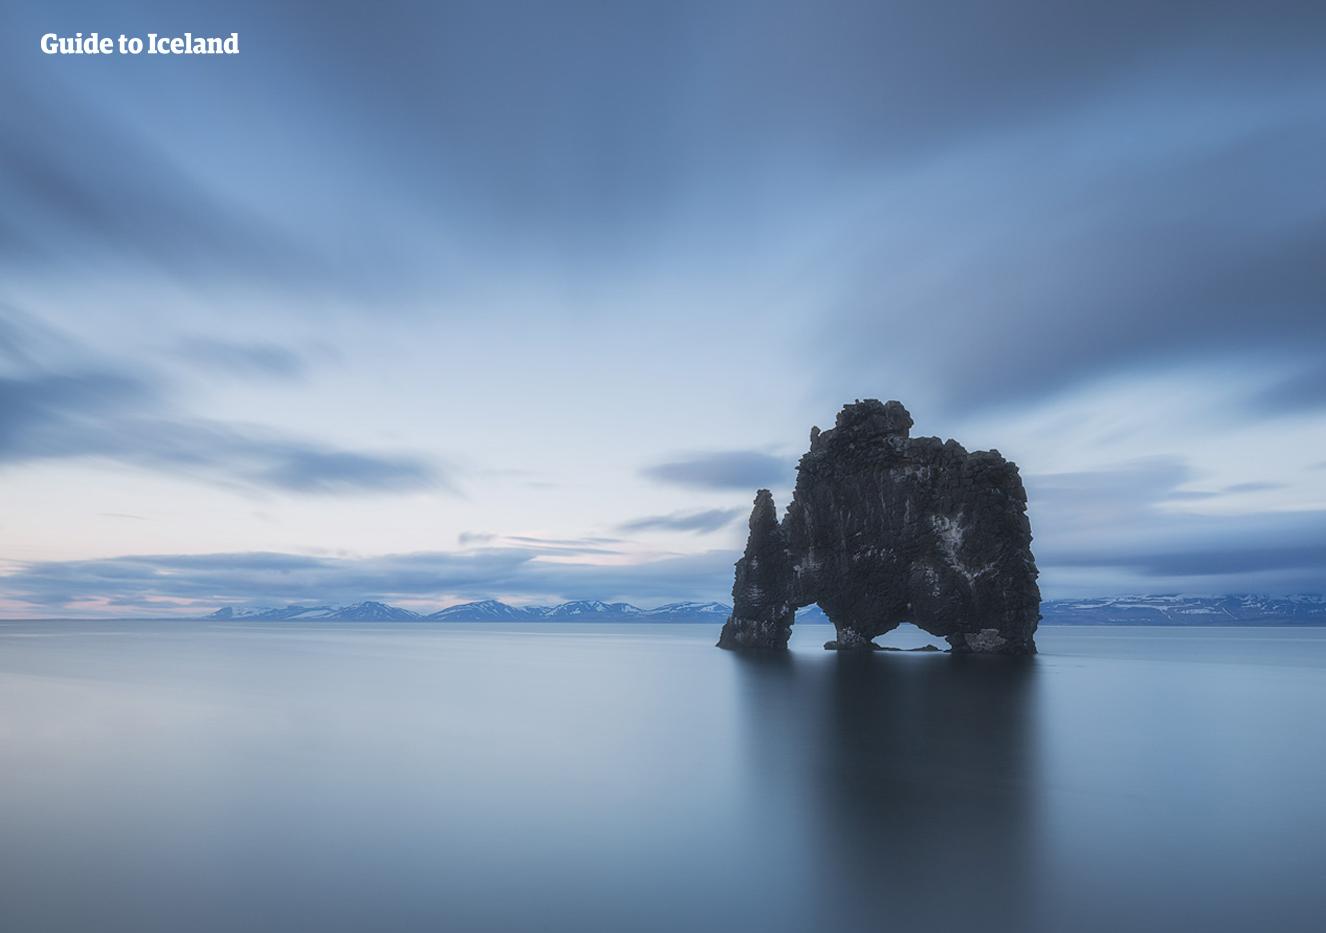 Hvitserkur is a rock on the Vatnsnes Peninsula that many photographers flock to.